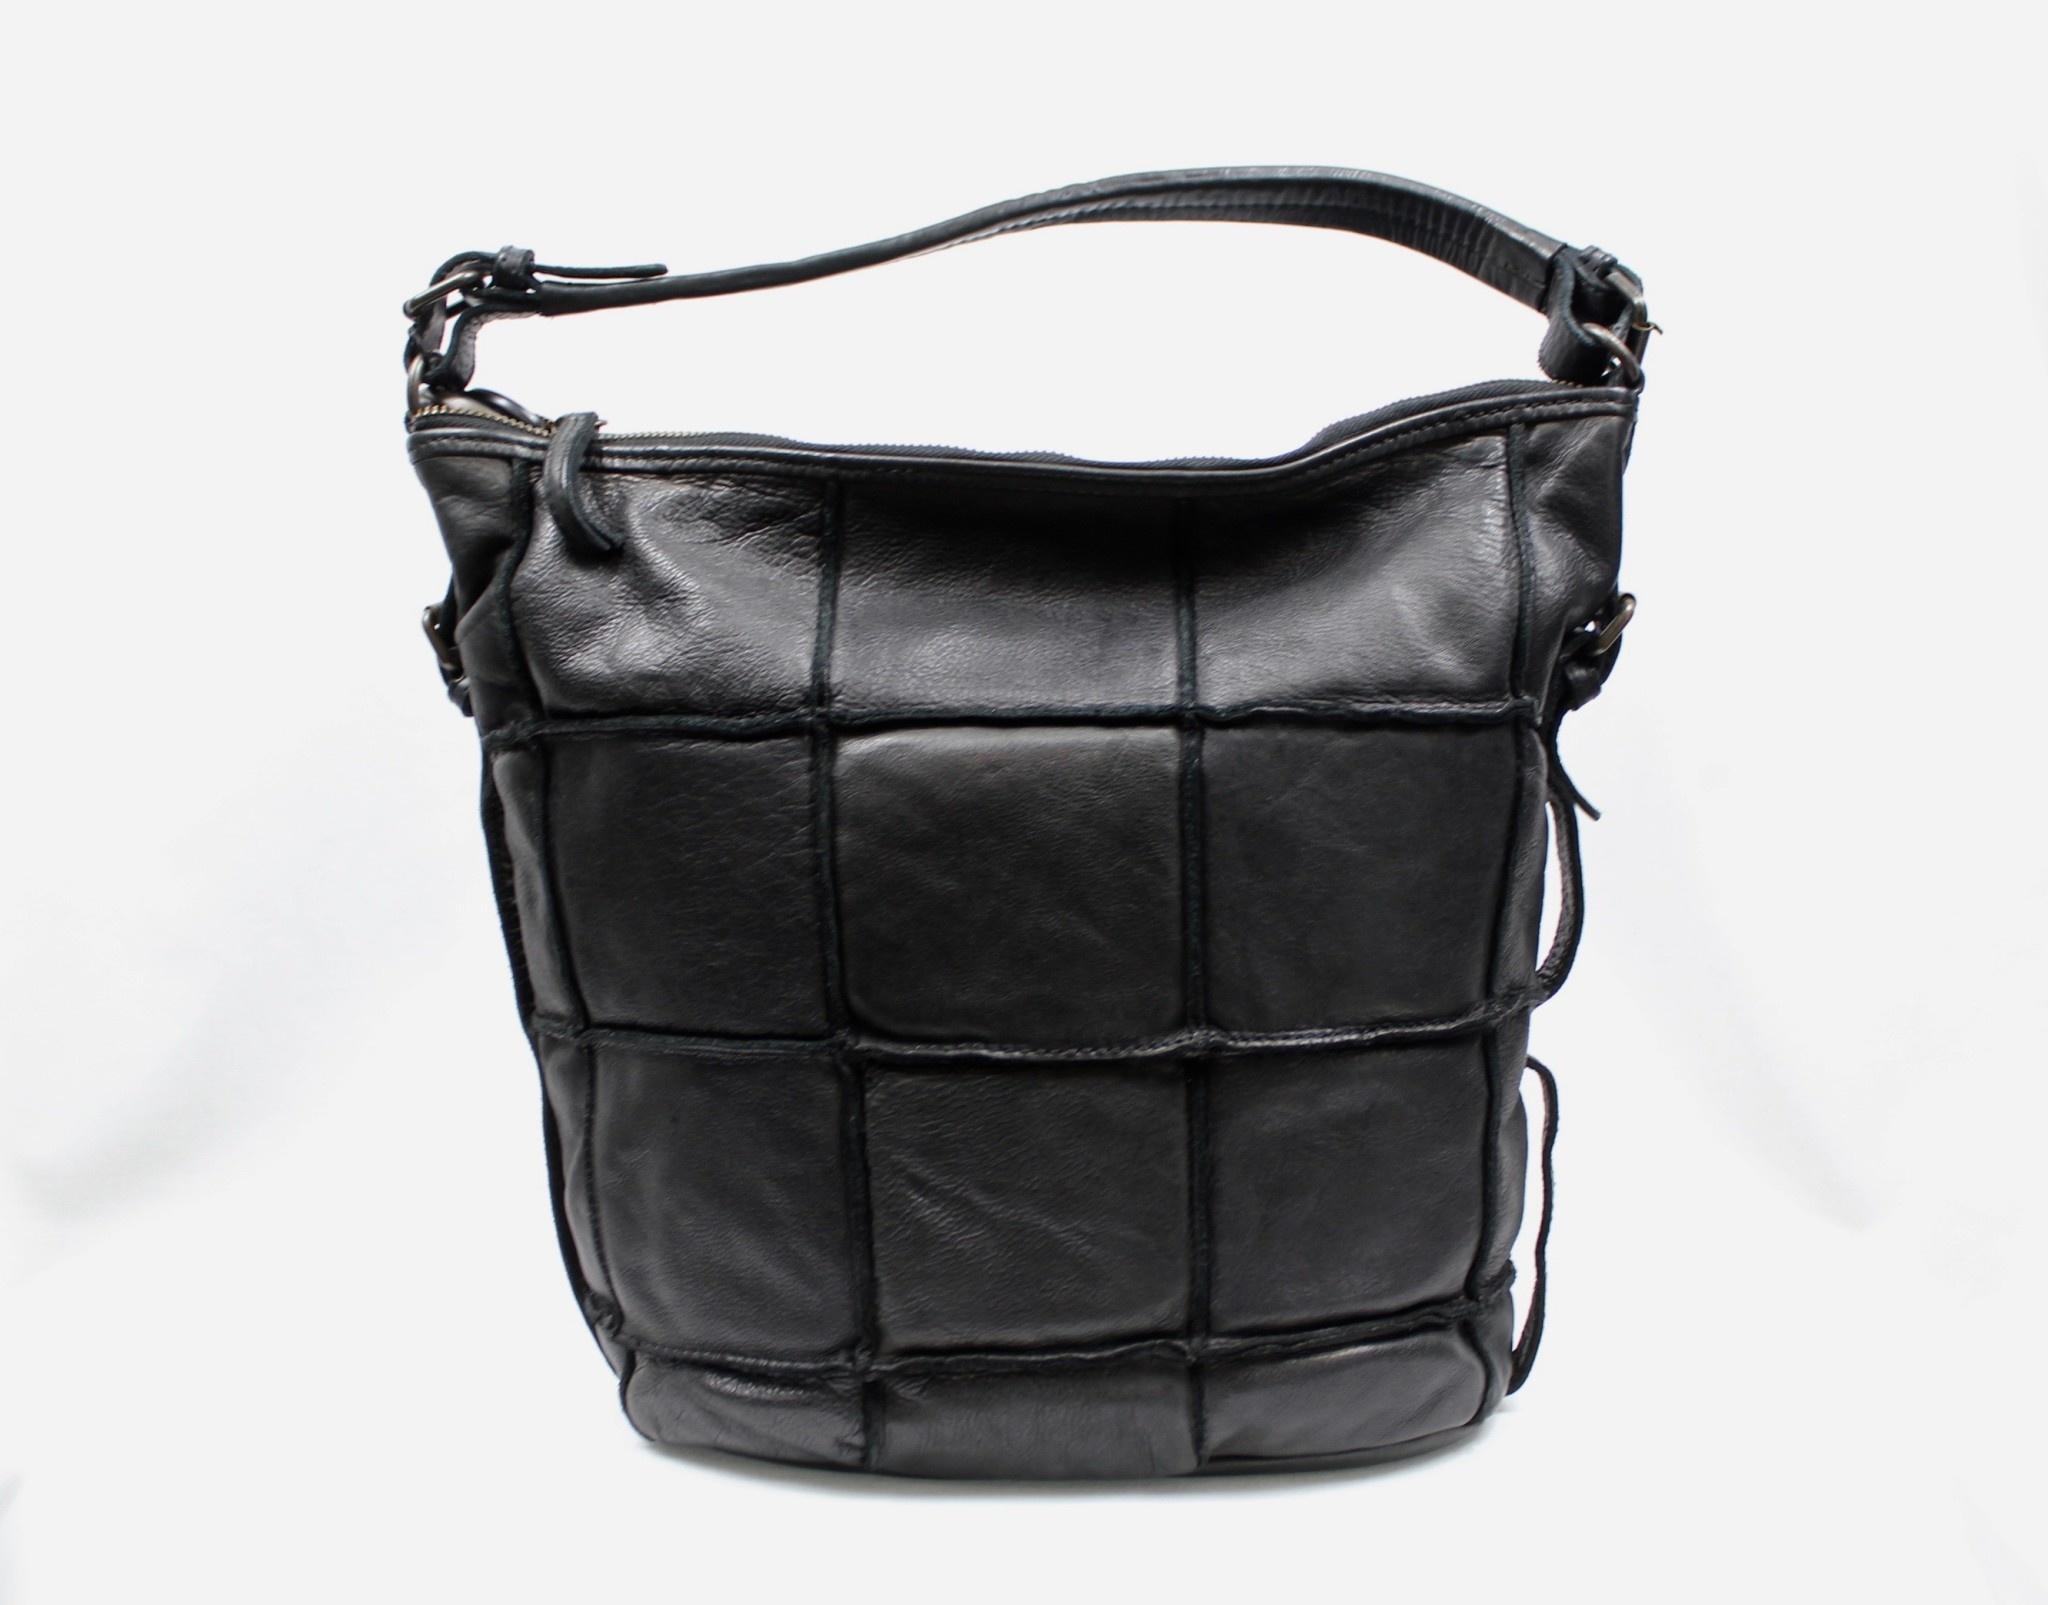 THE TREND THE TREND 24394 Black Hobo Handbag